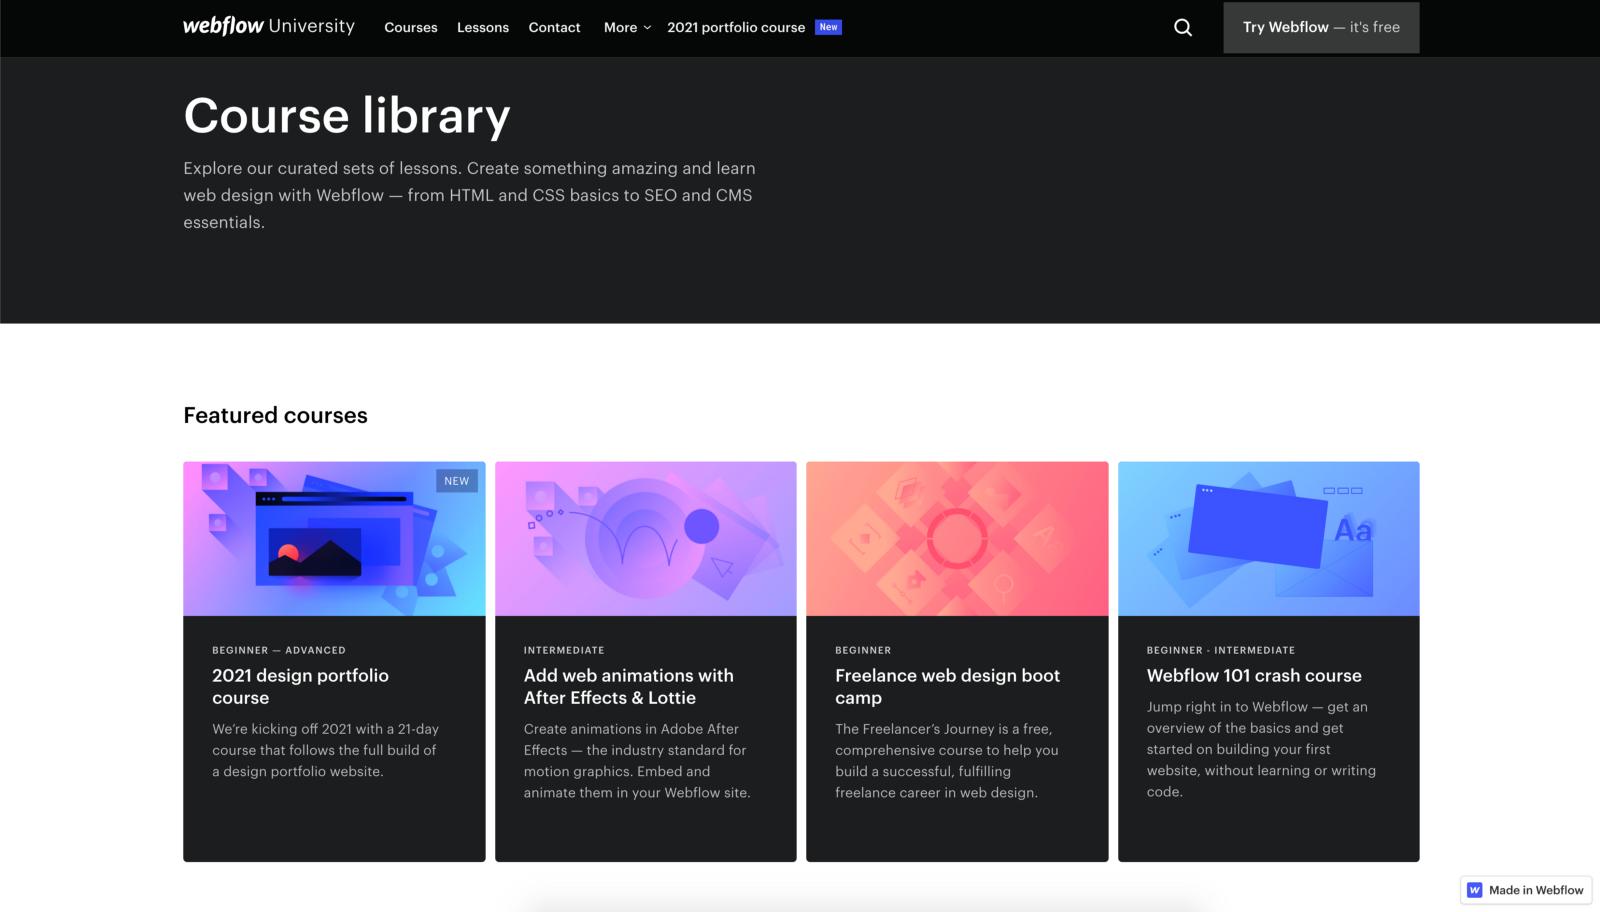 Webflow University course library